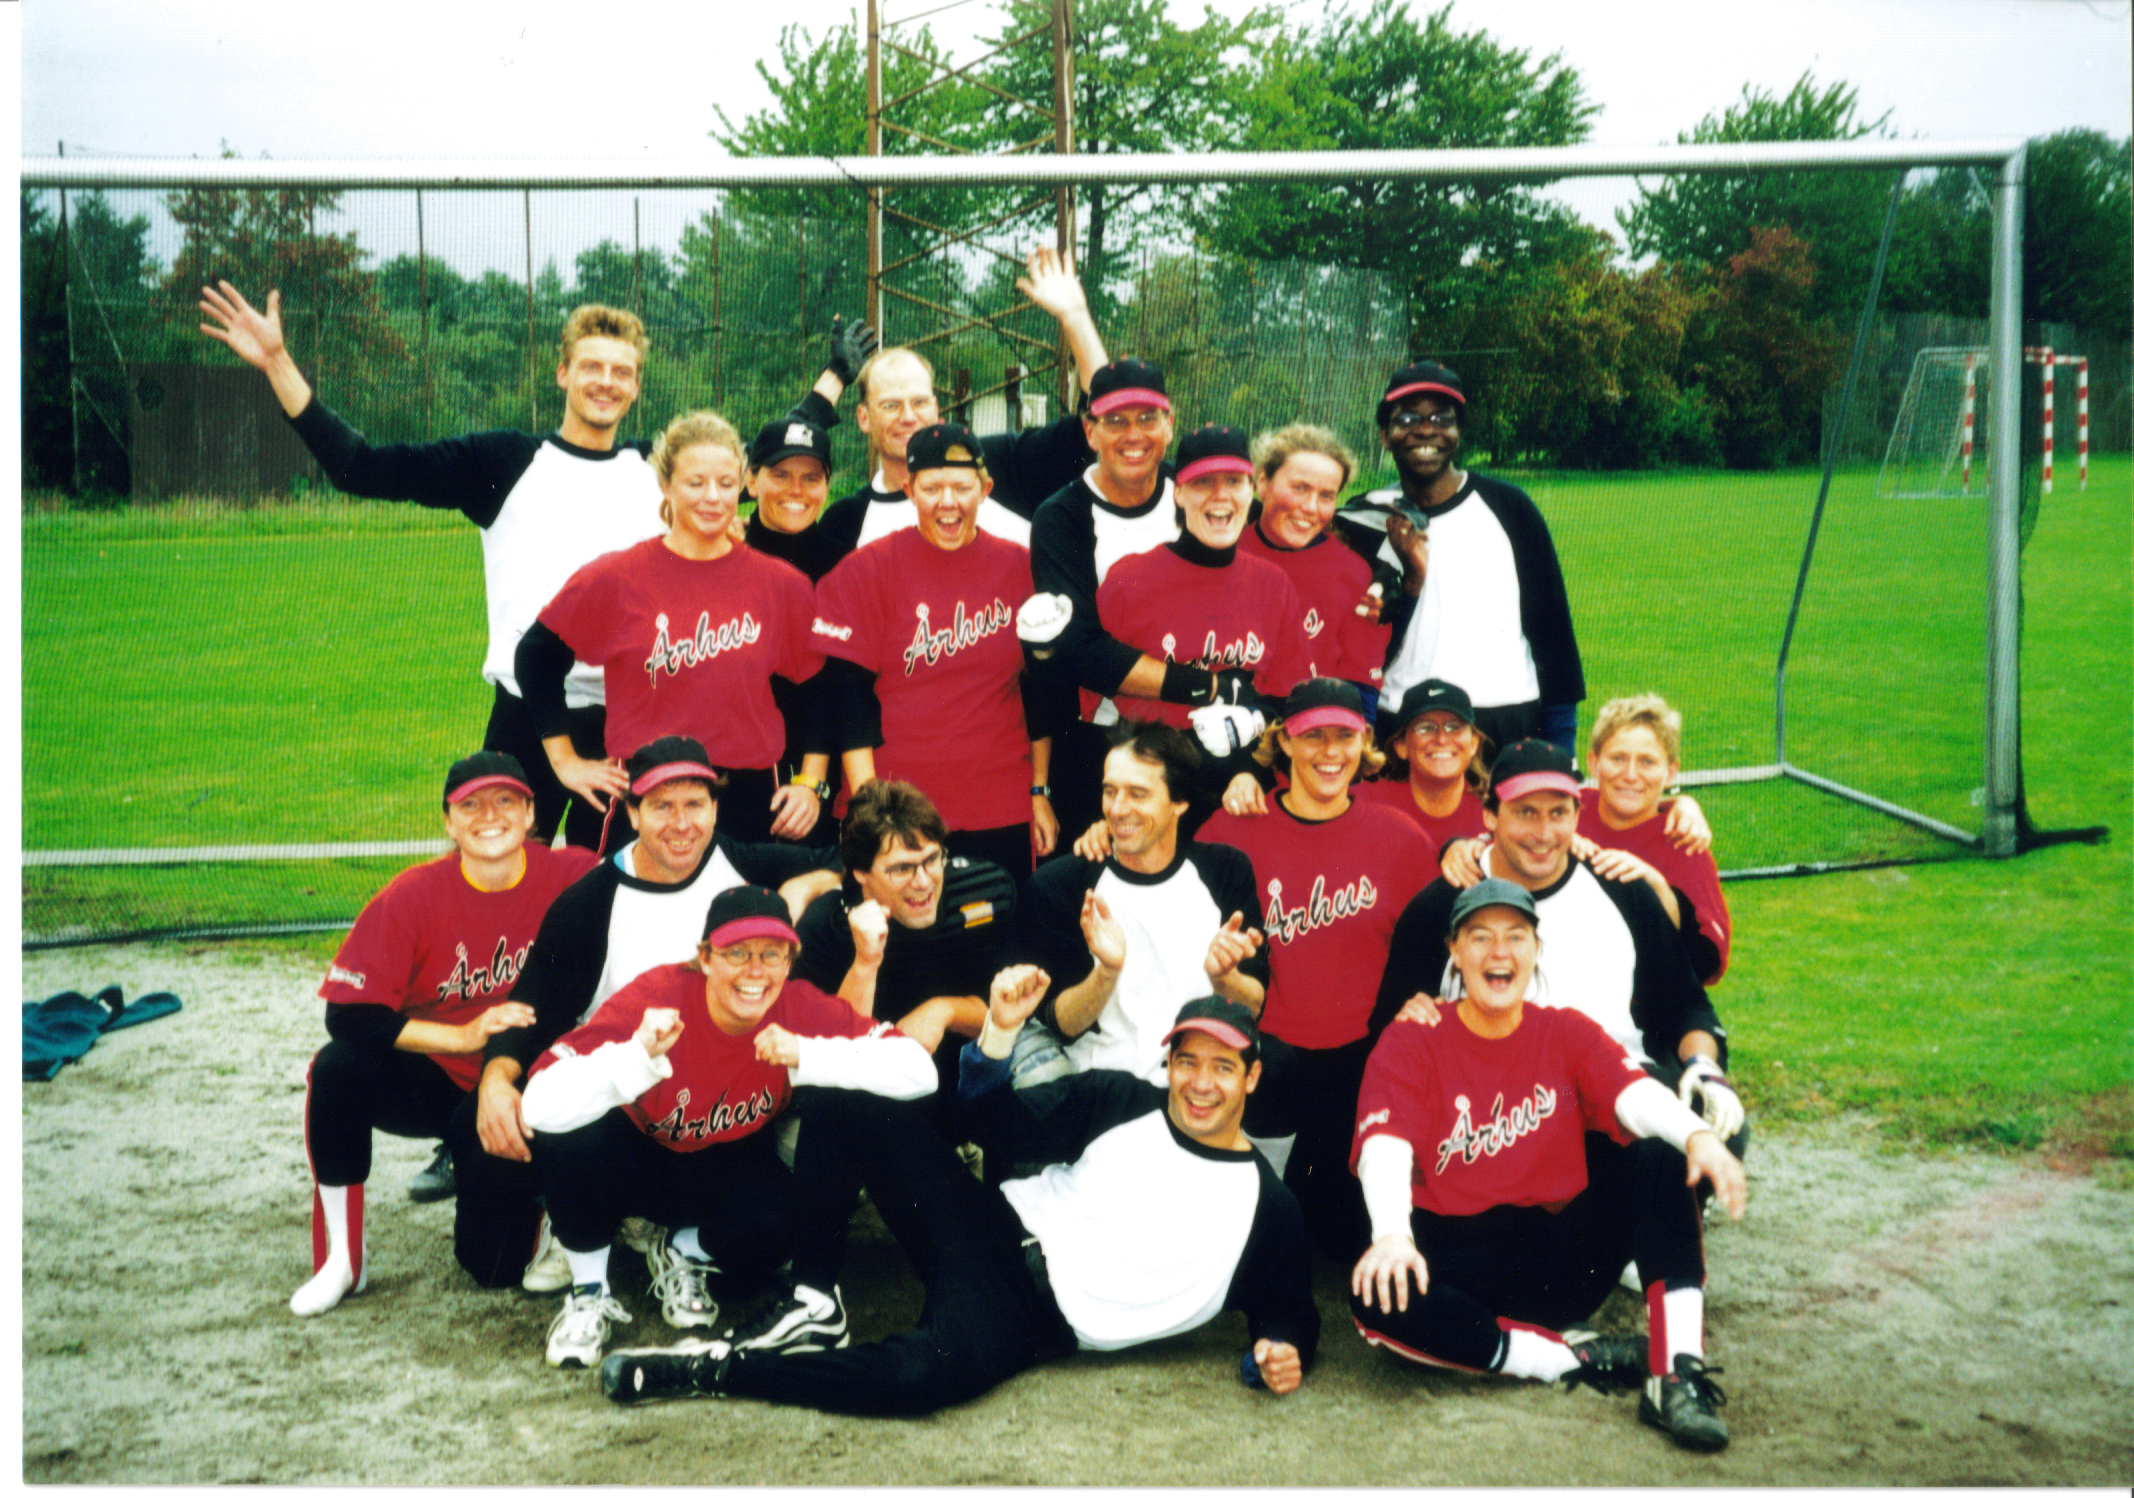 Århus Baseball Softball Klub, year 2000